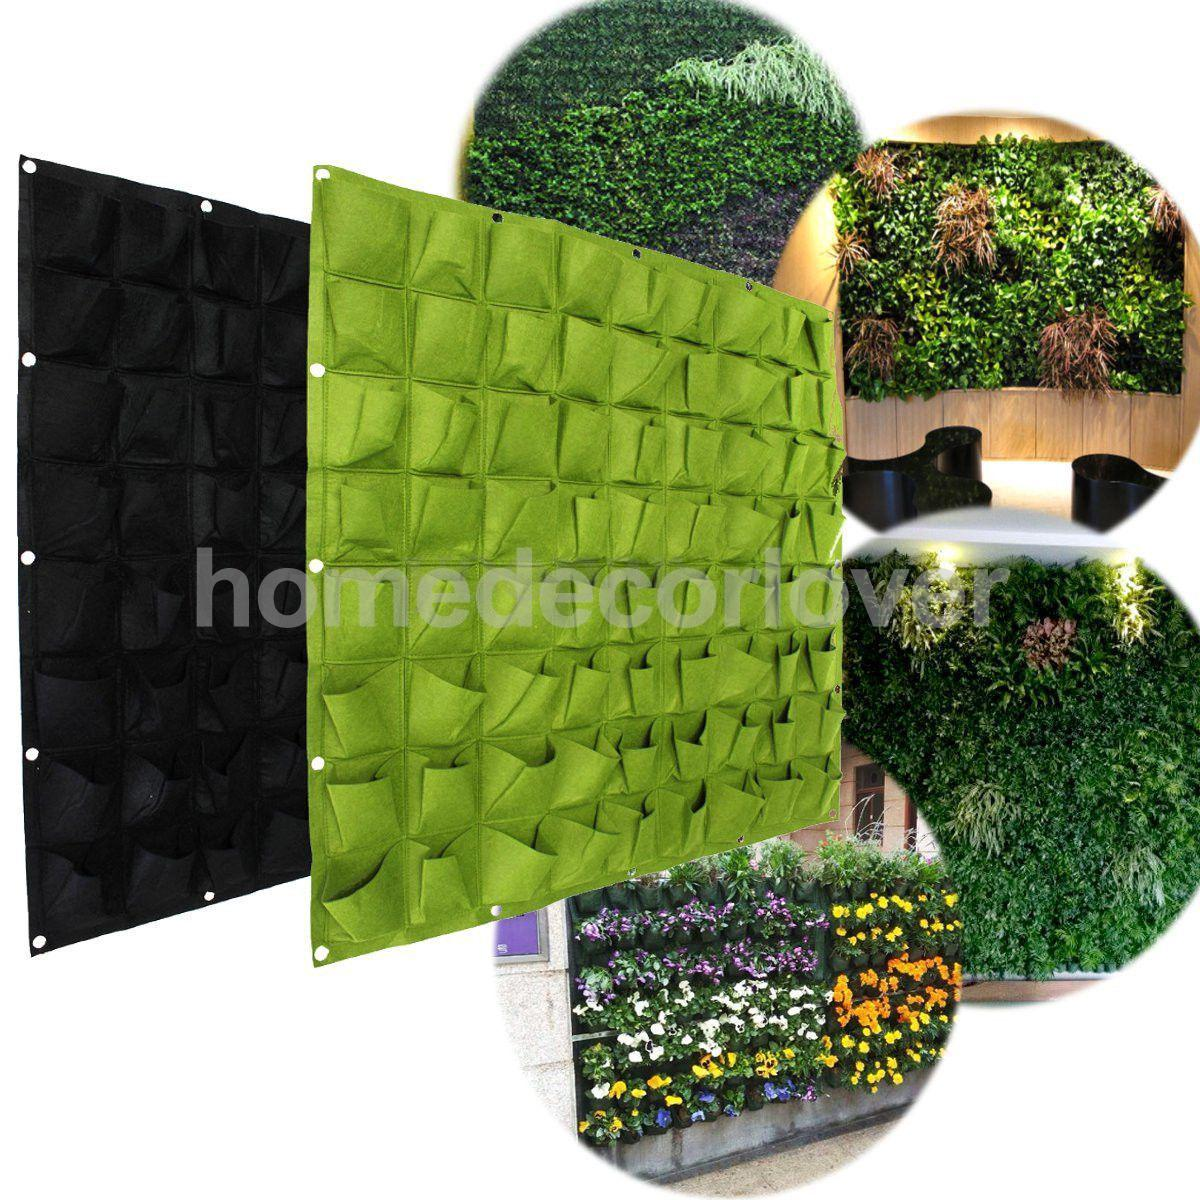 72 Pockets Hanging Garden Wall Flower Planter Bag Indoor/Outdoor Herb  Pot(China (